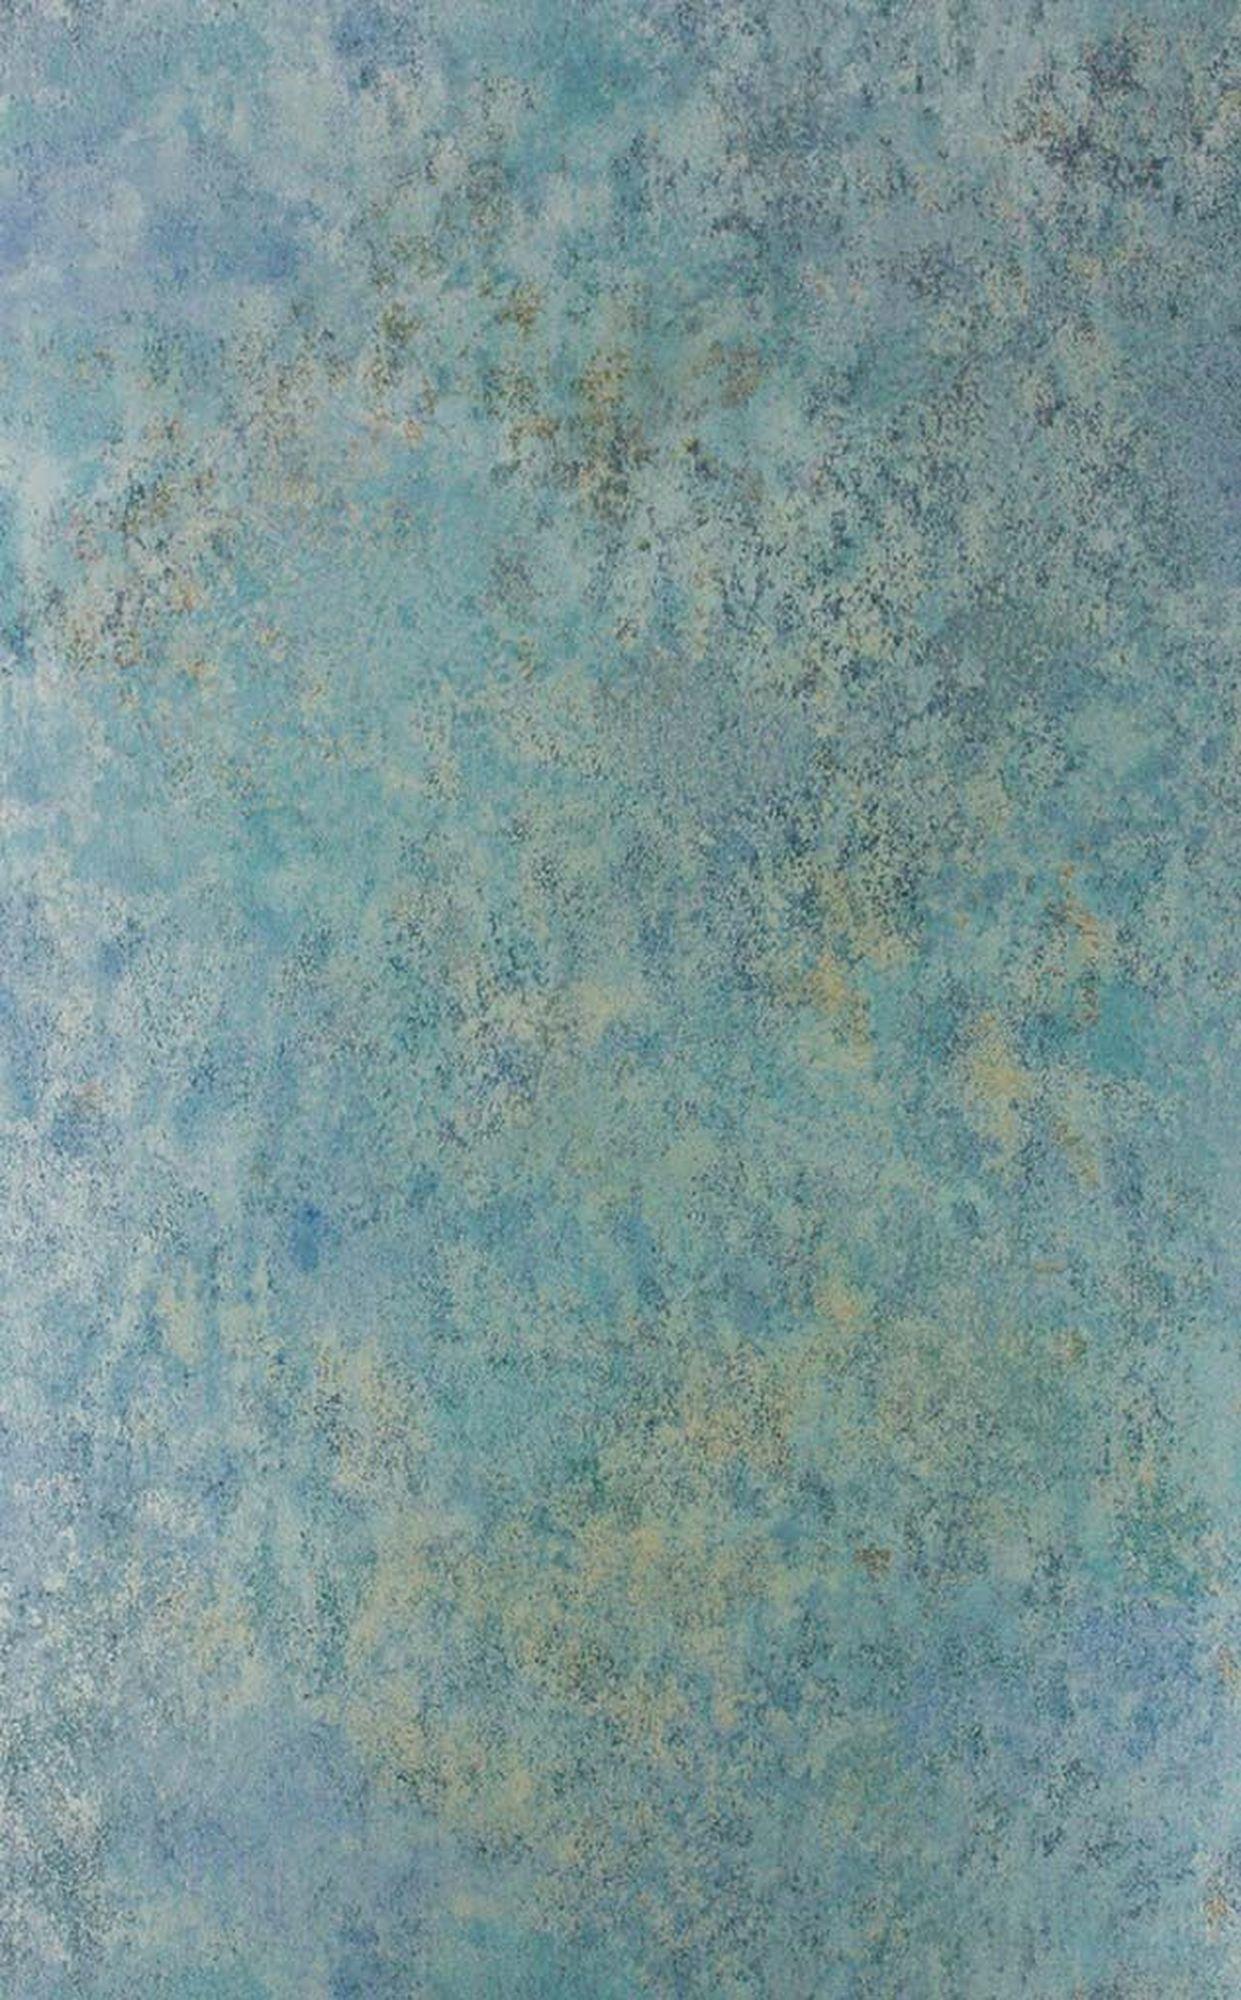 Osborne And Little Enchanted Gardens Fresco - HD Wallpaper